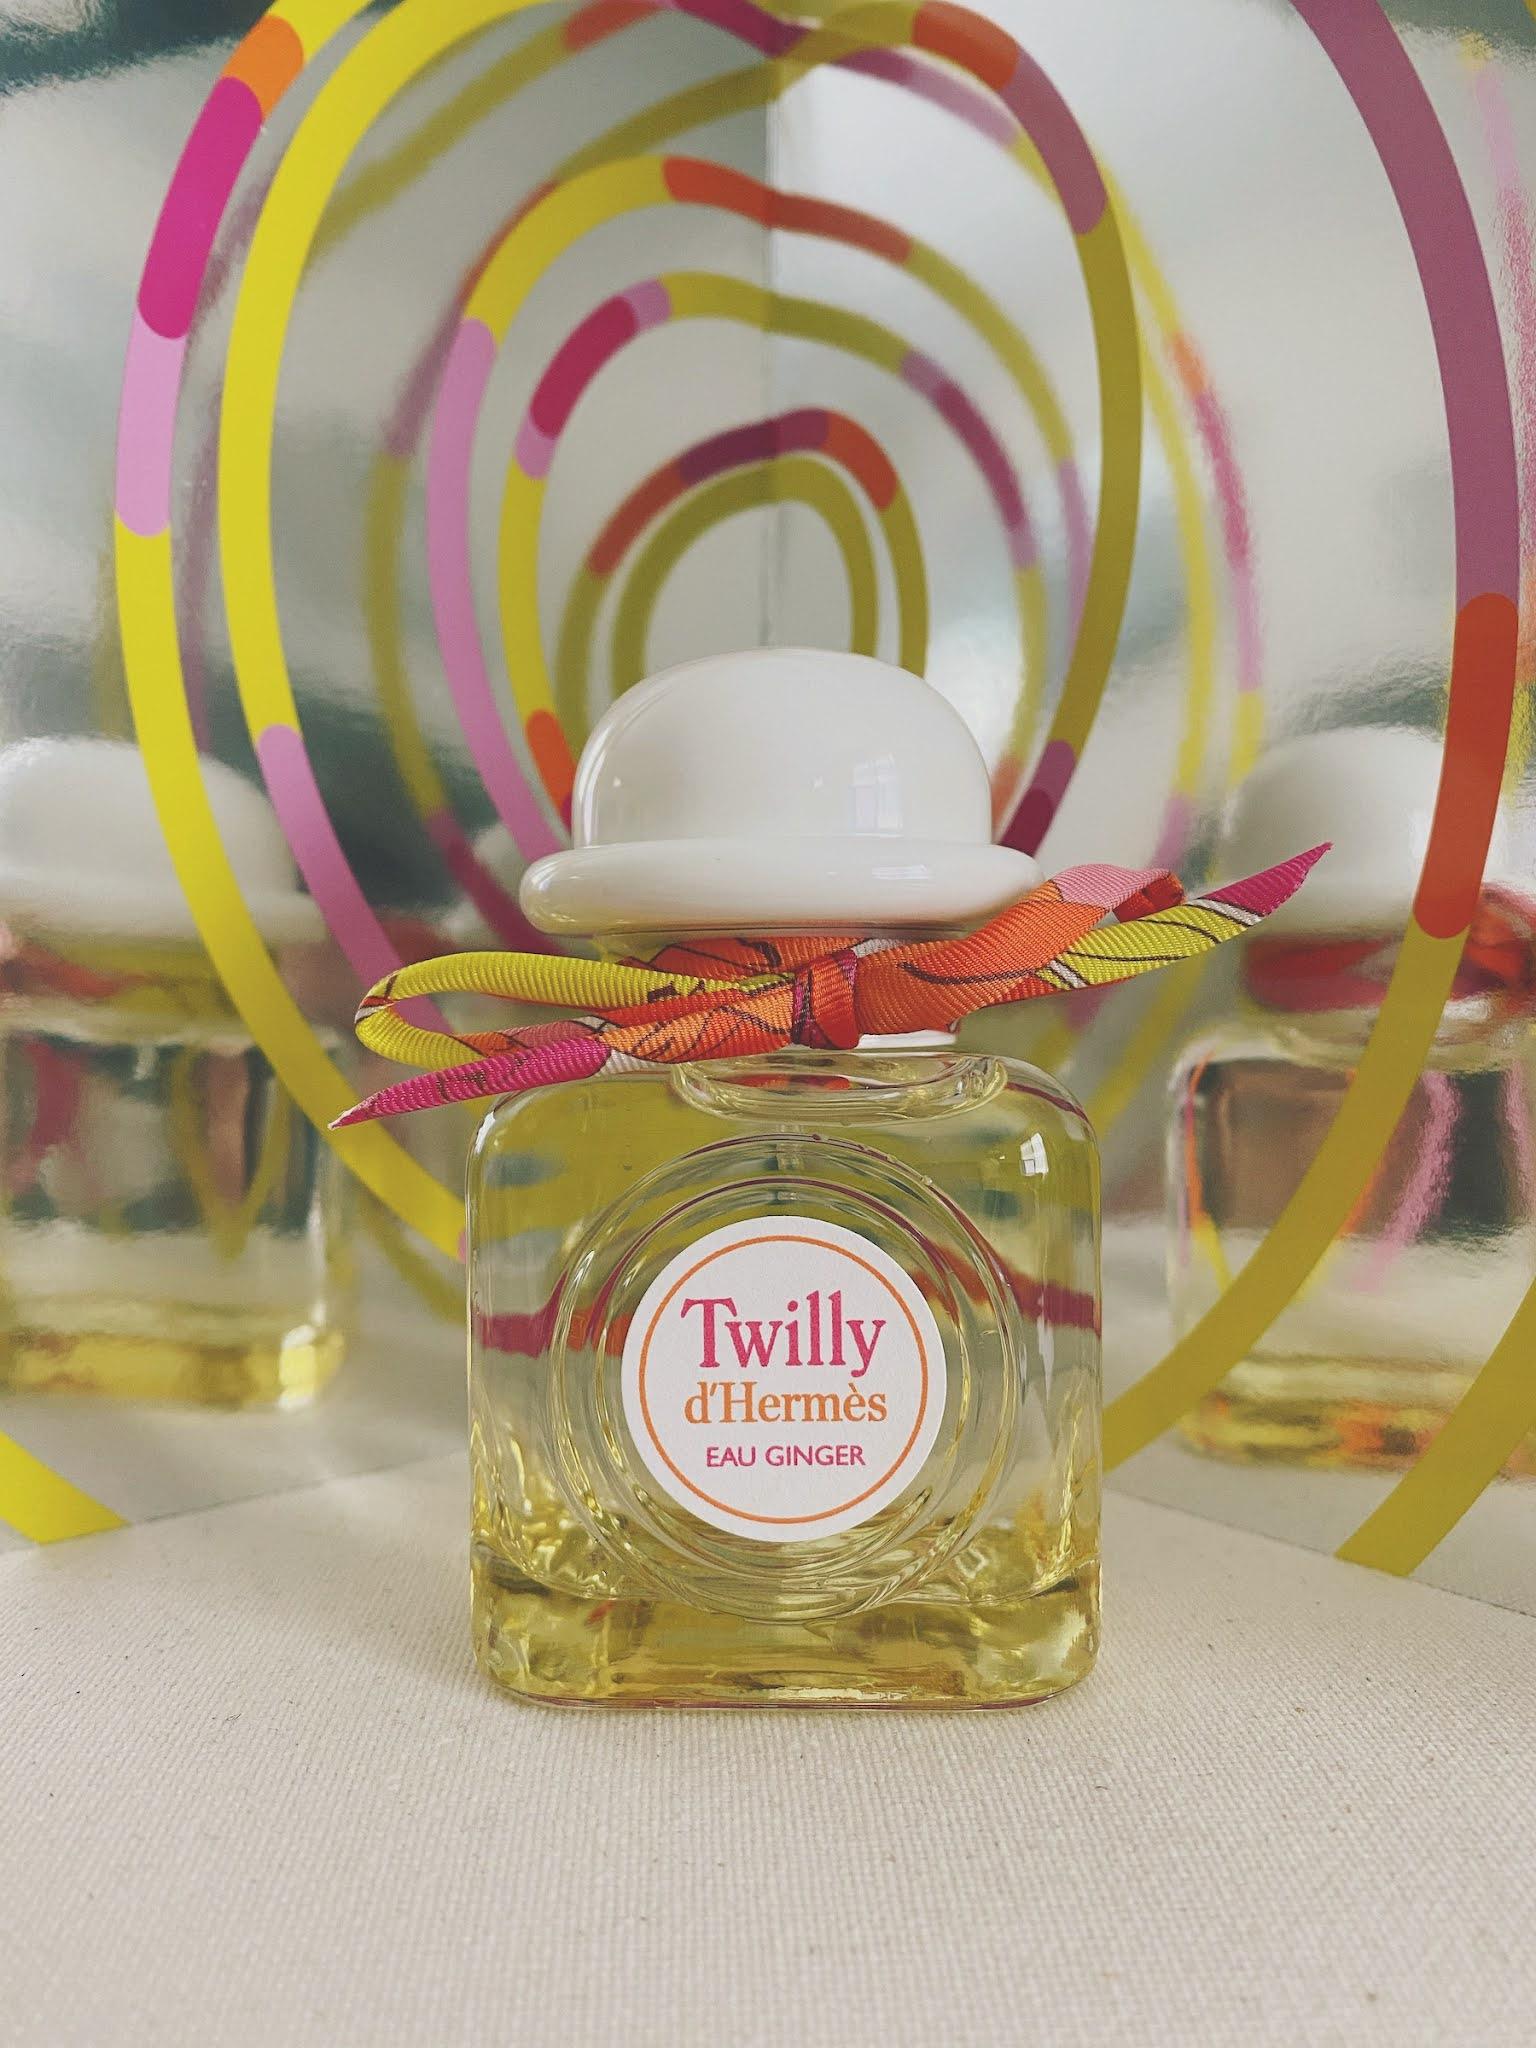 Twilly d'Hermès Eau Ginger by Hermès: A quick review